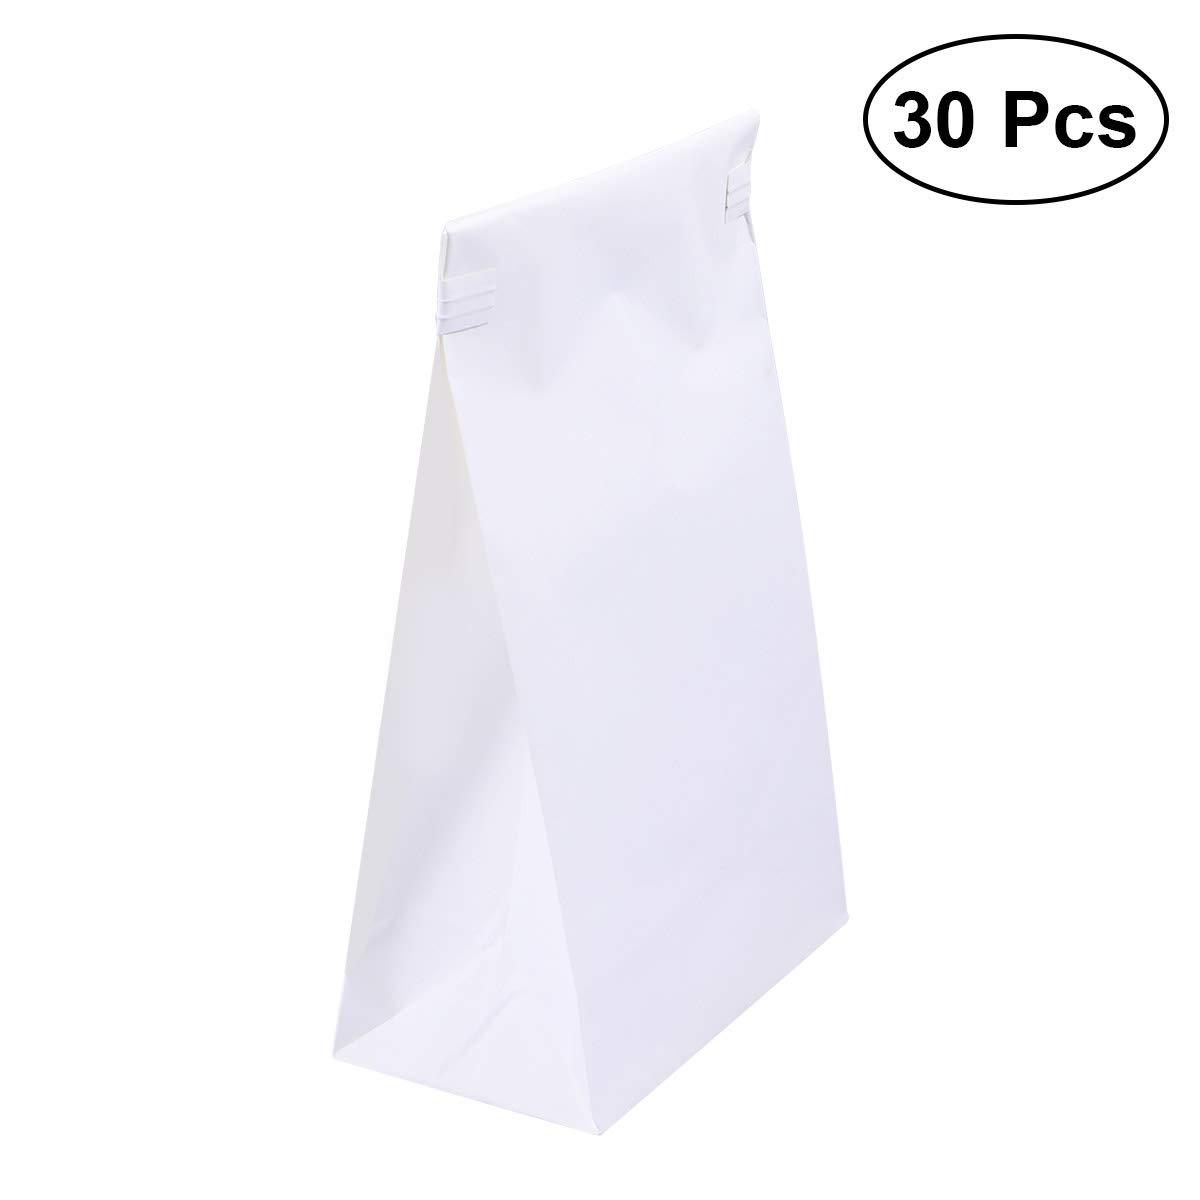 Hemobllo 30pcs vomit bags Disposable emesis bags barf bag (White)